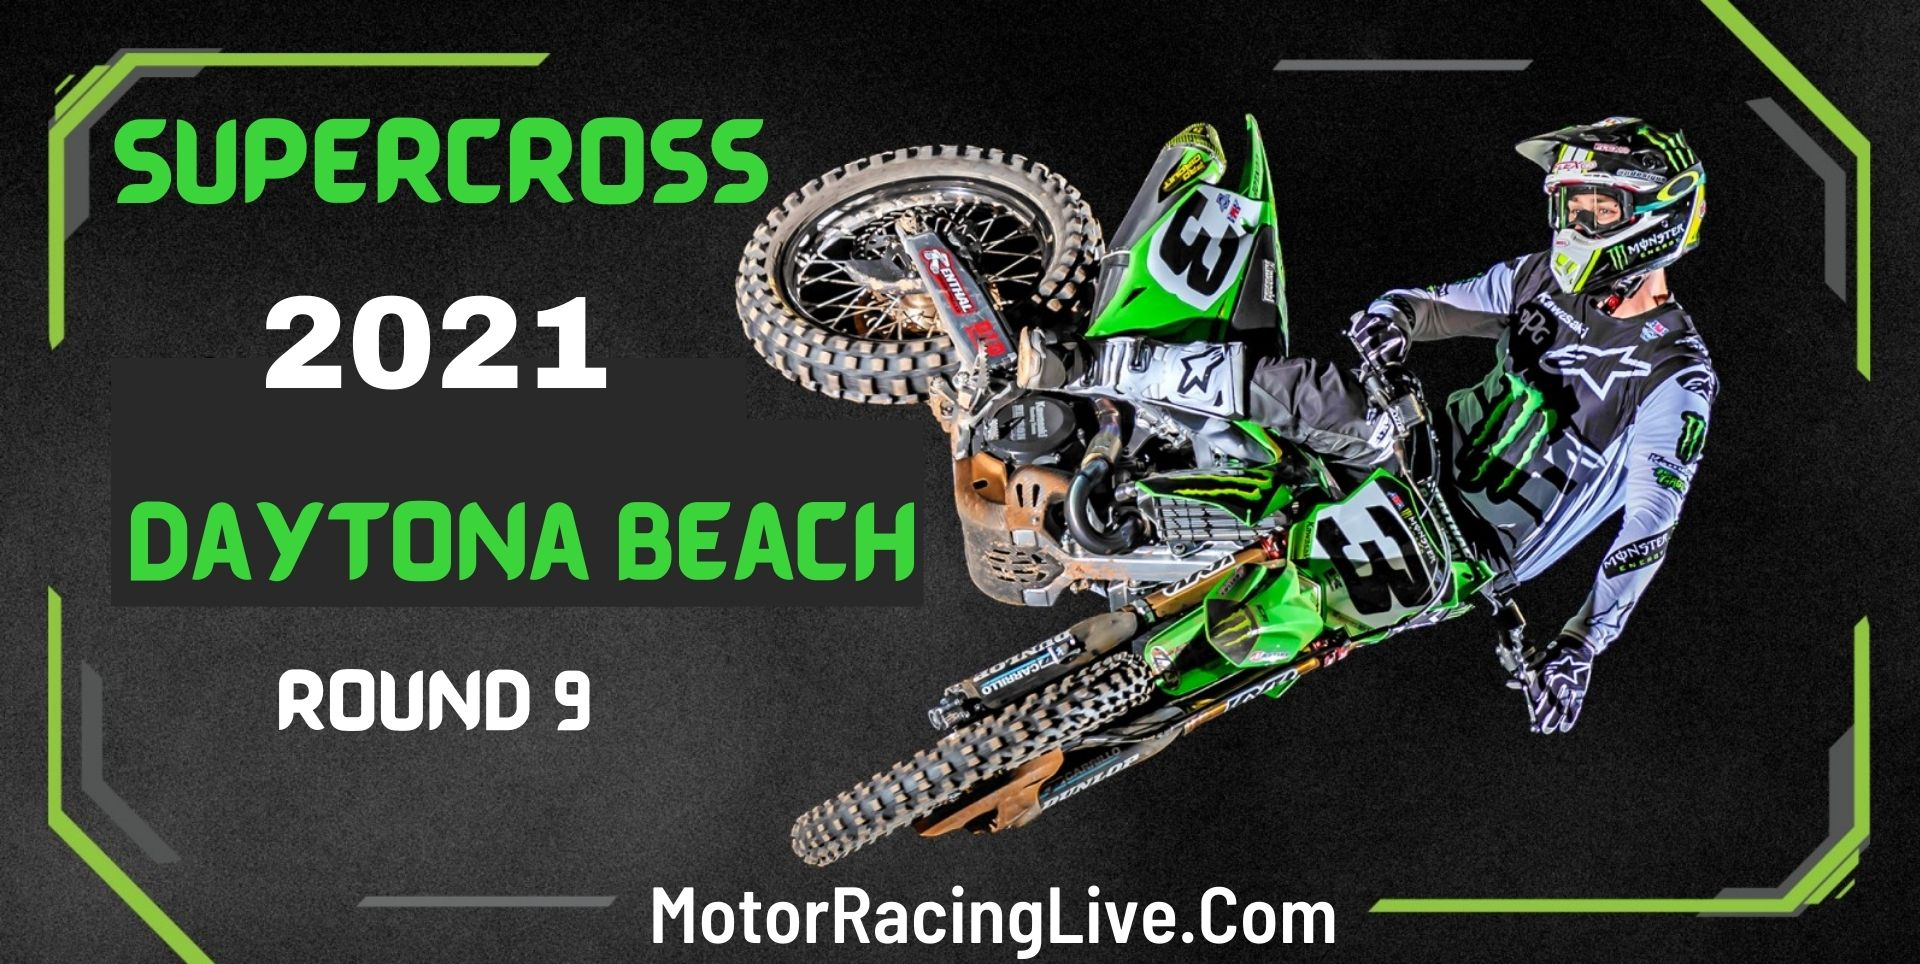 Supercross Daytona Beach Rd 9 Live 6-Mar 2021